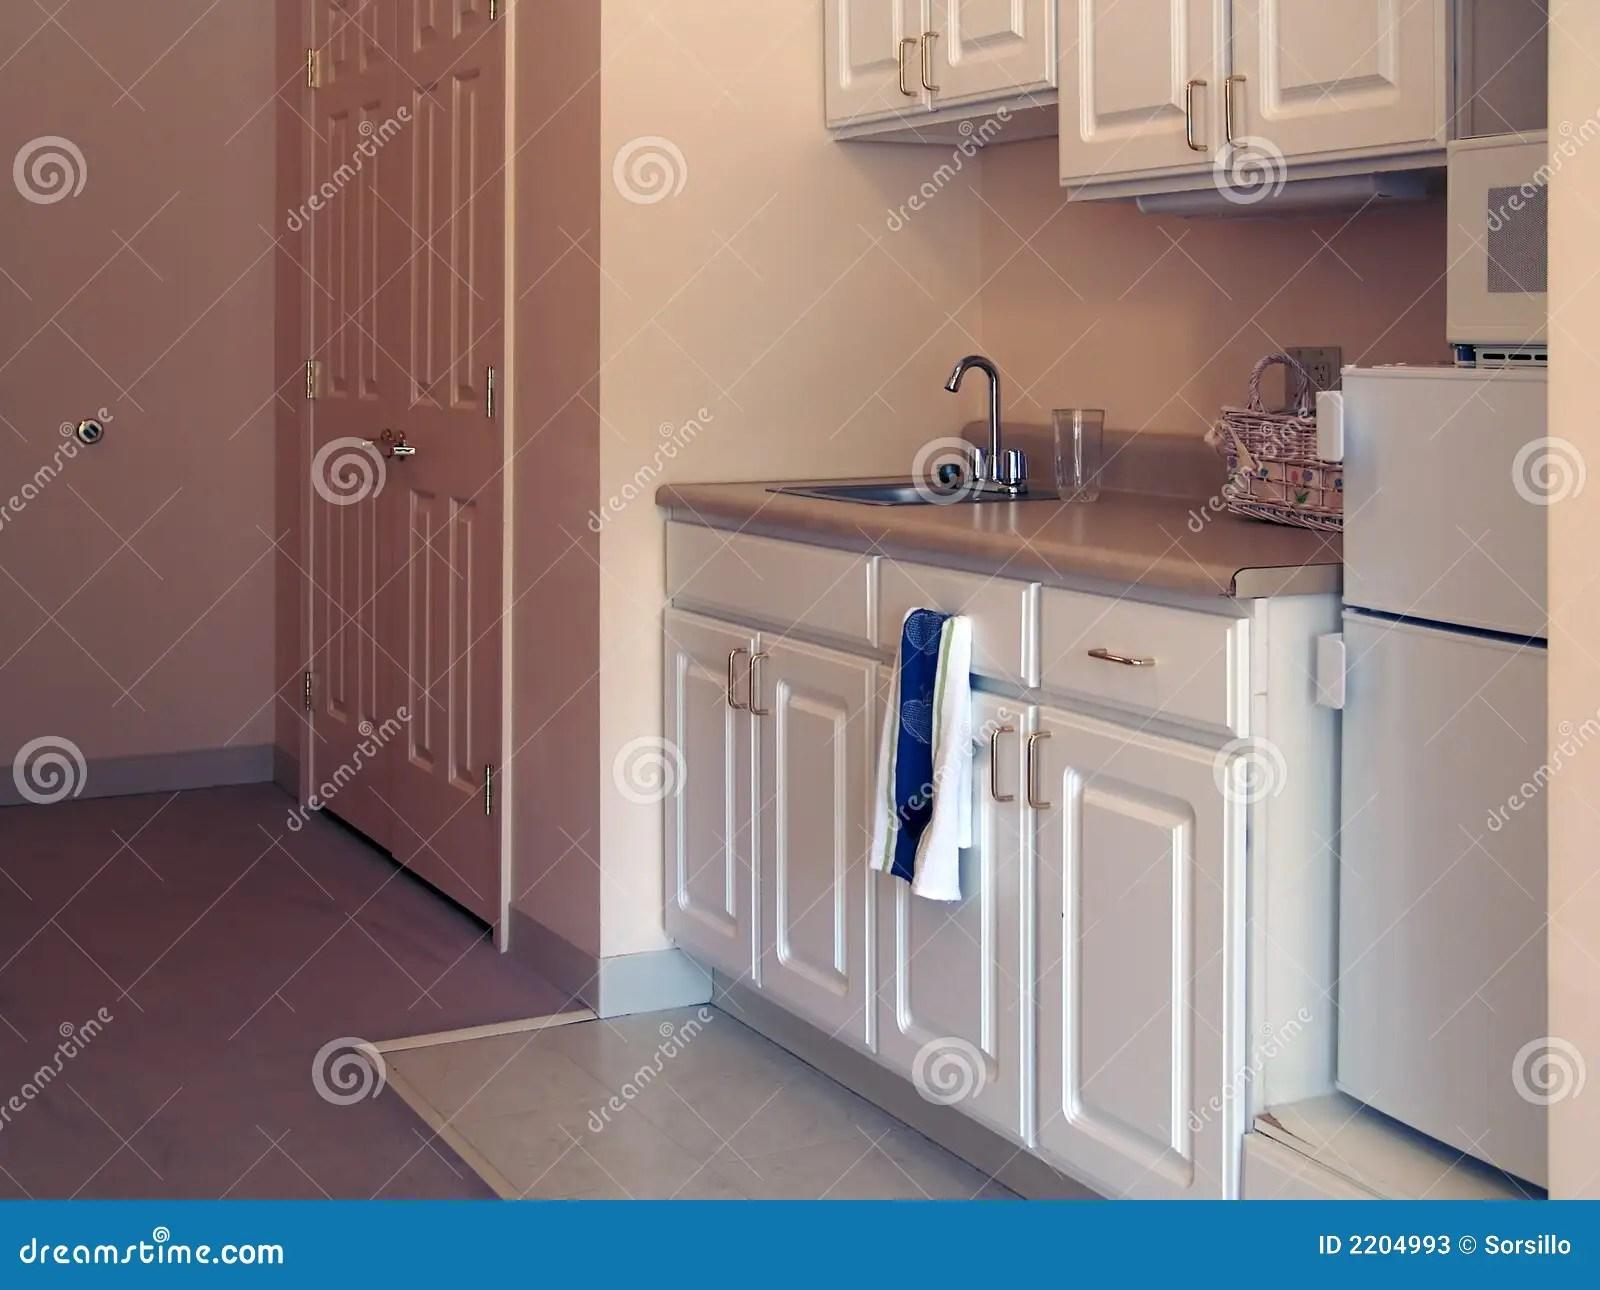 small kitchen rugs contemporary island 小厨房库存图片 图片包括有玻璃 烤箱 壁橱 宿舍 空白 水槽 微波 小厨房